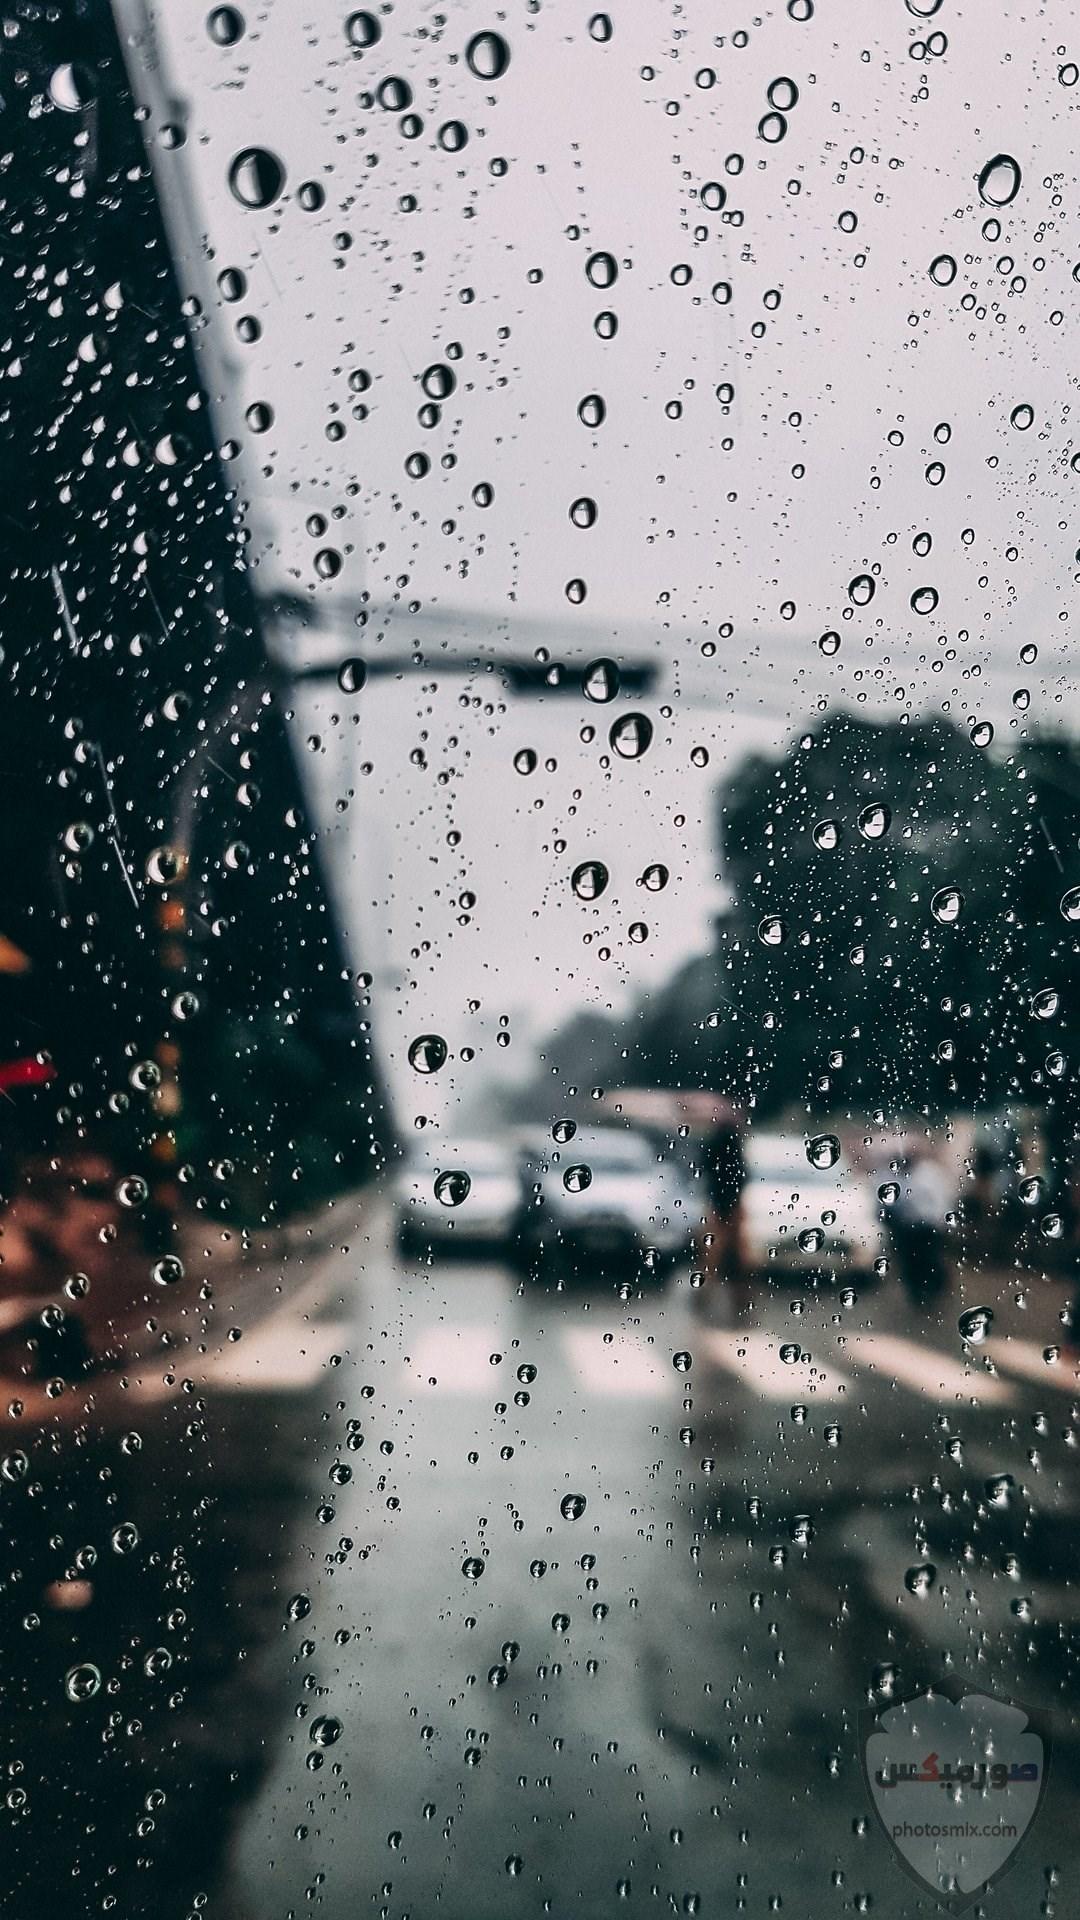 صور مطر جديدة 2020 photos rain خلفيات مطر 1 1